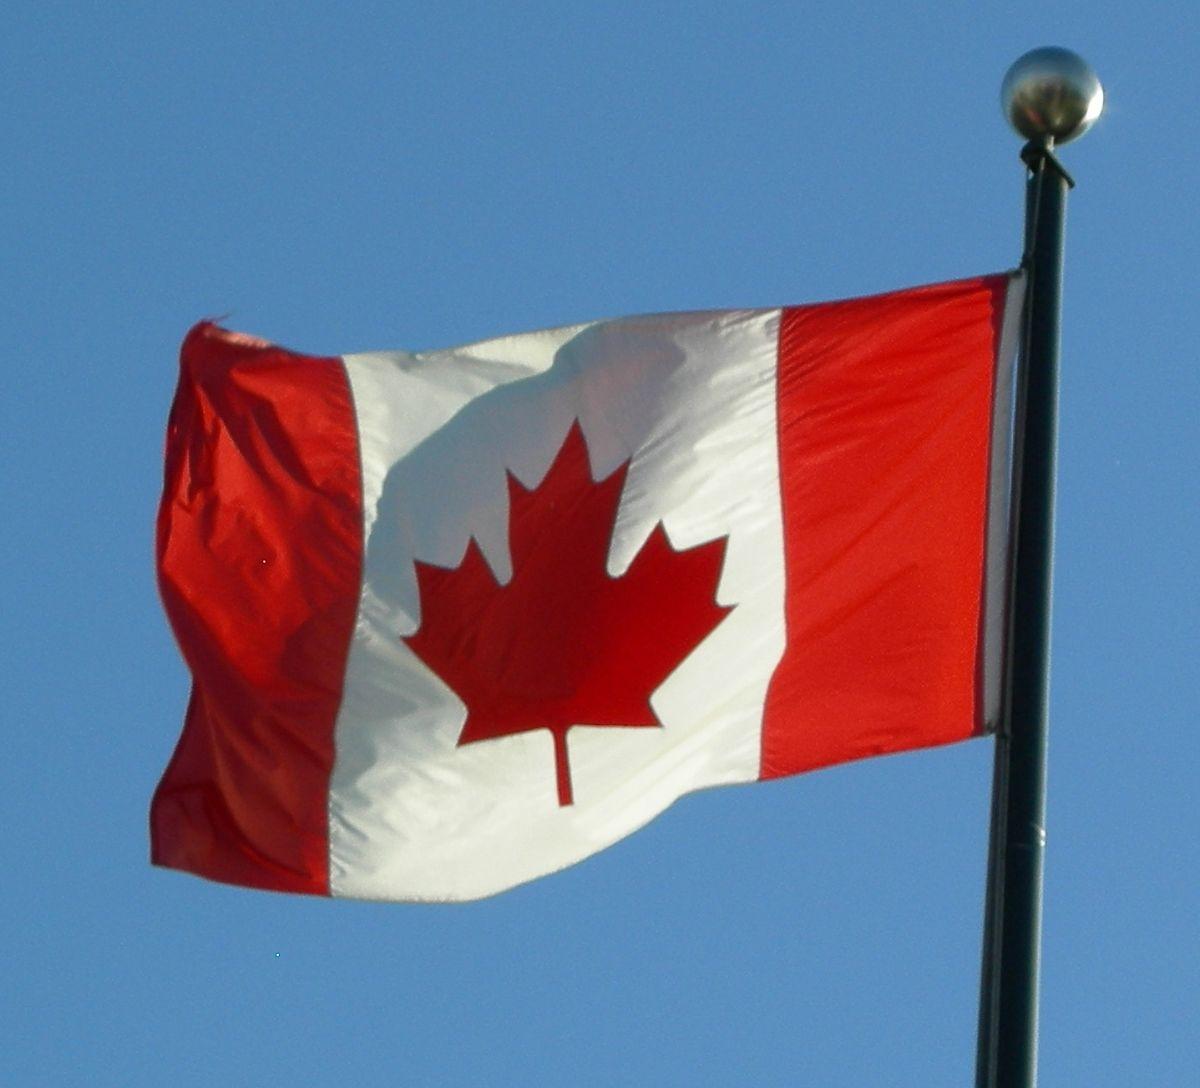 blame Canada - Wiktionary